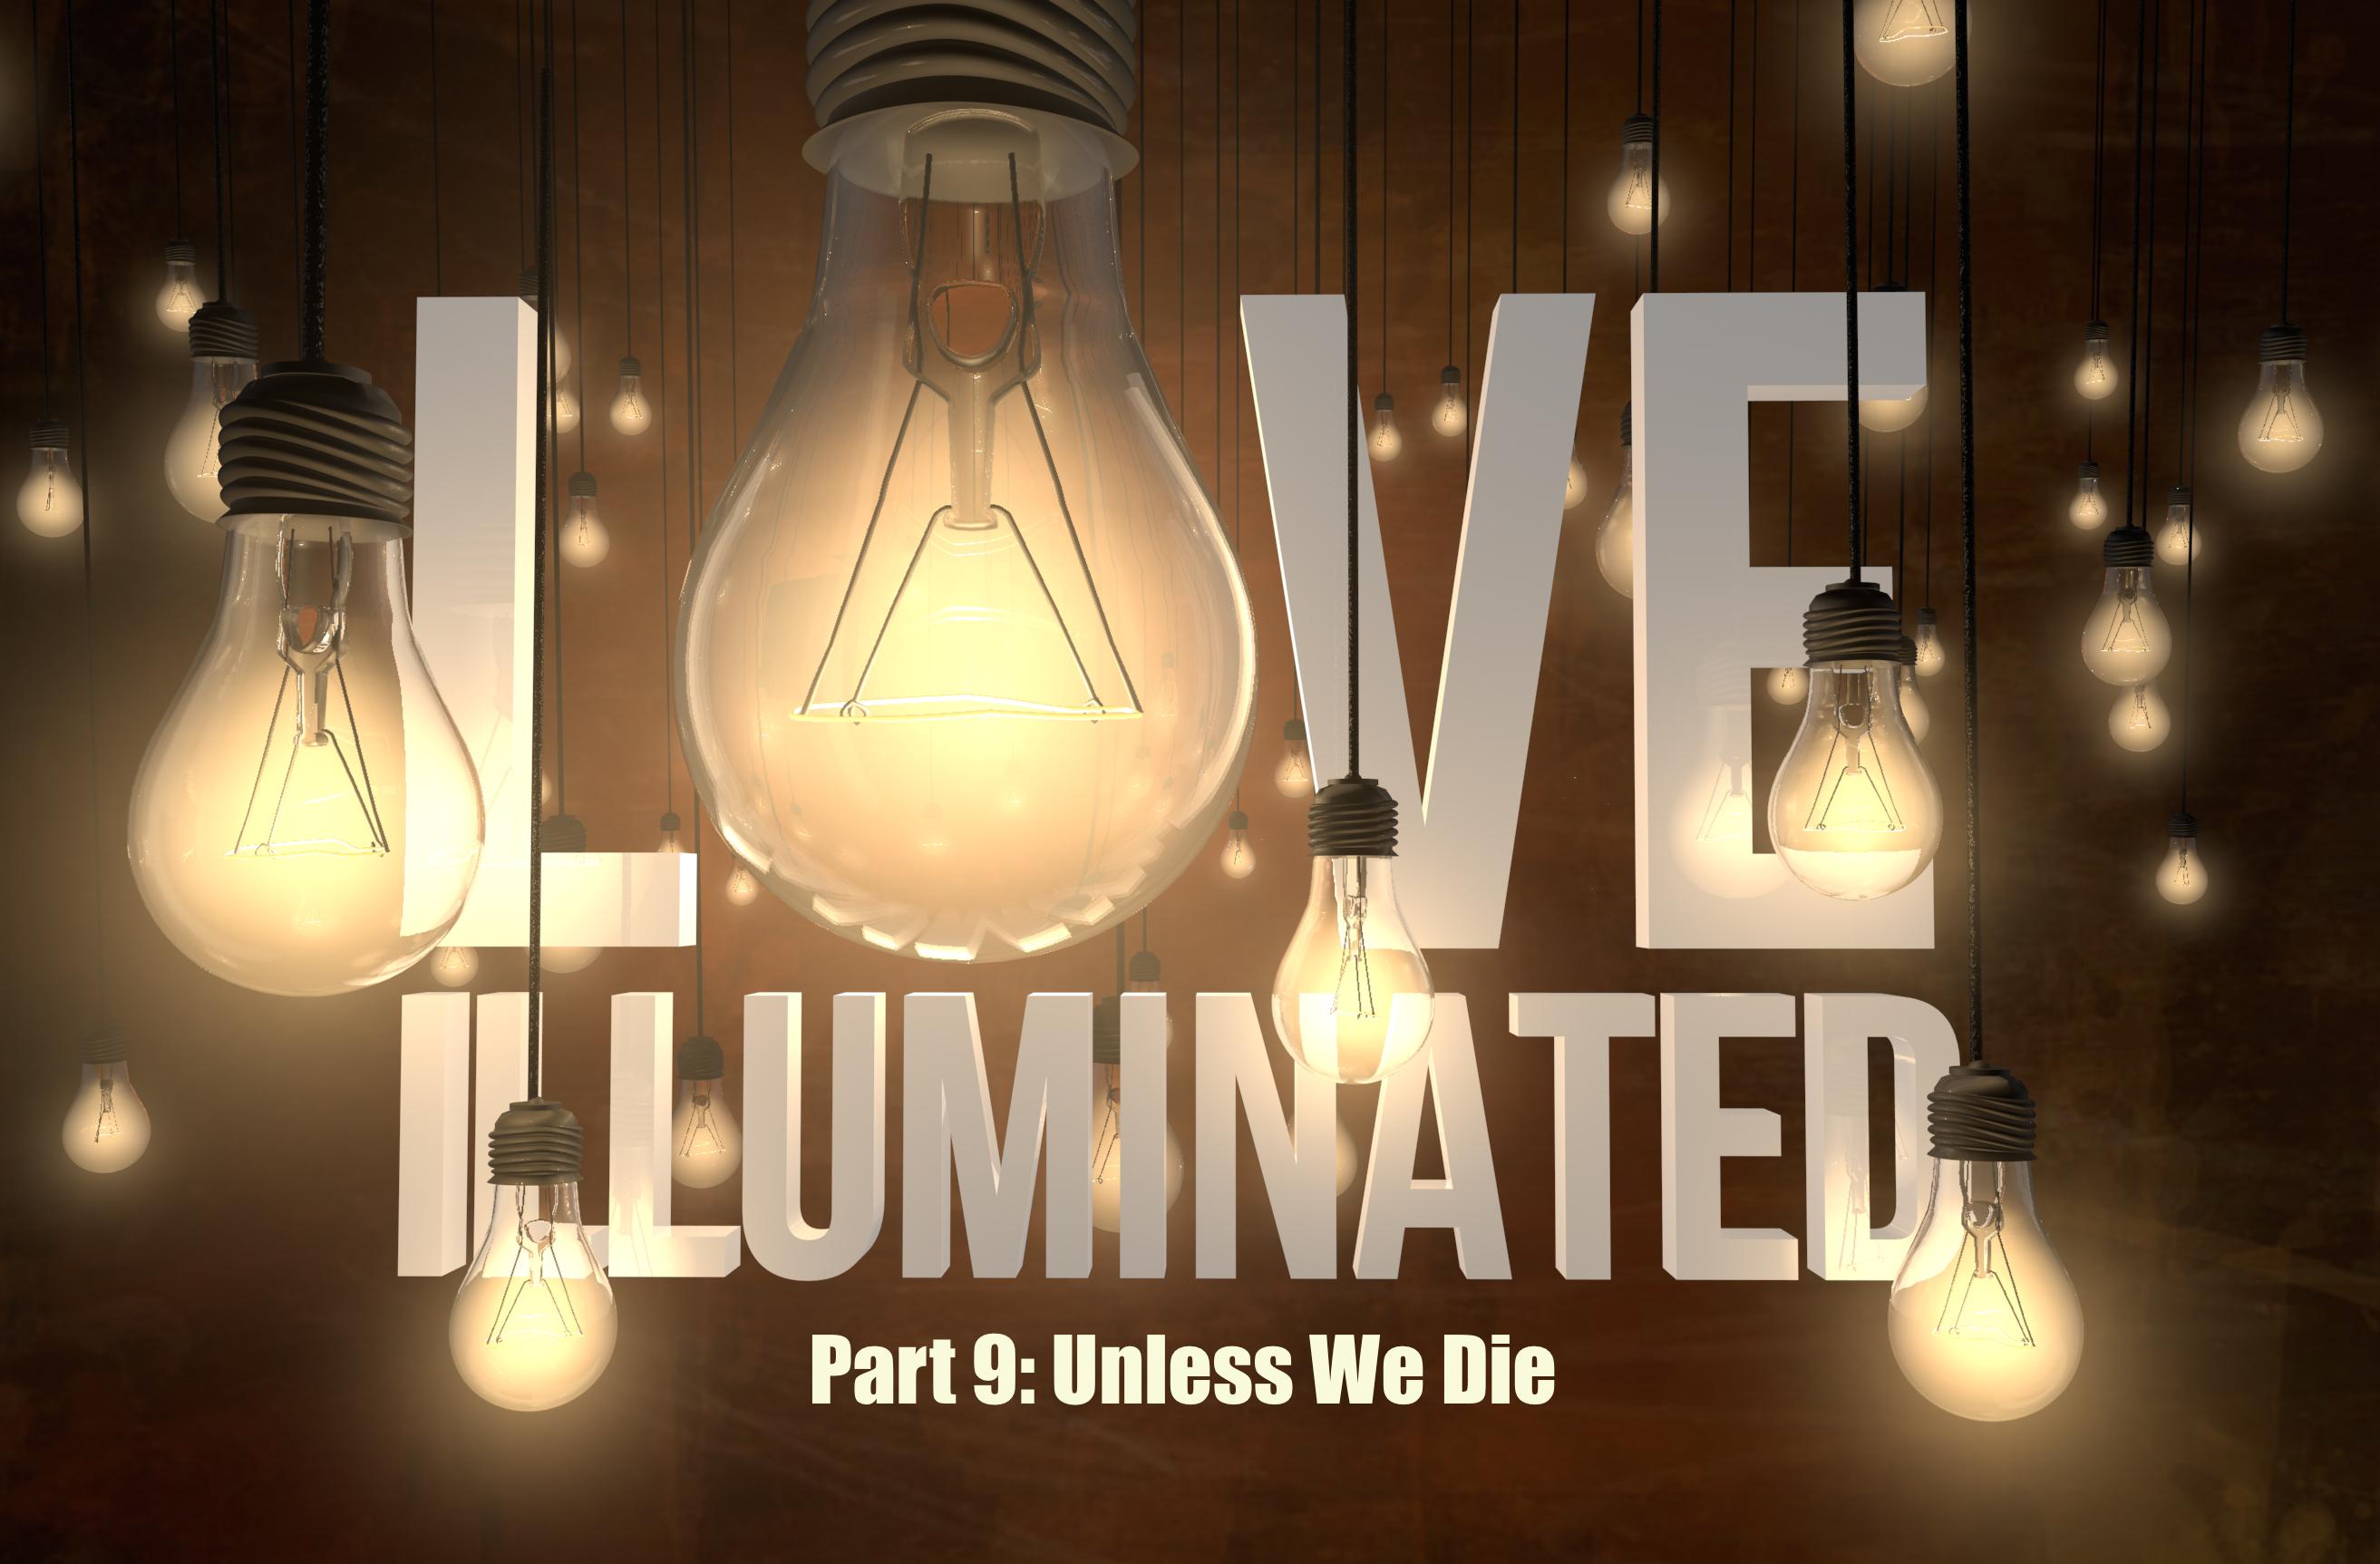 Love Illuminated, Part 9: Unless We Die